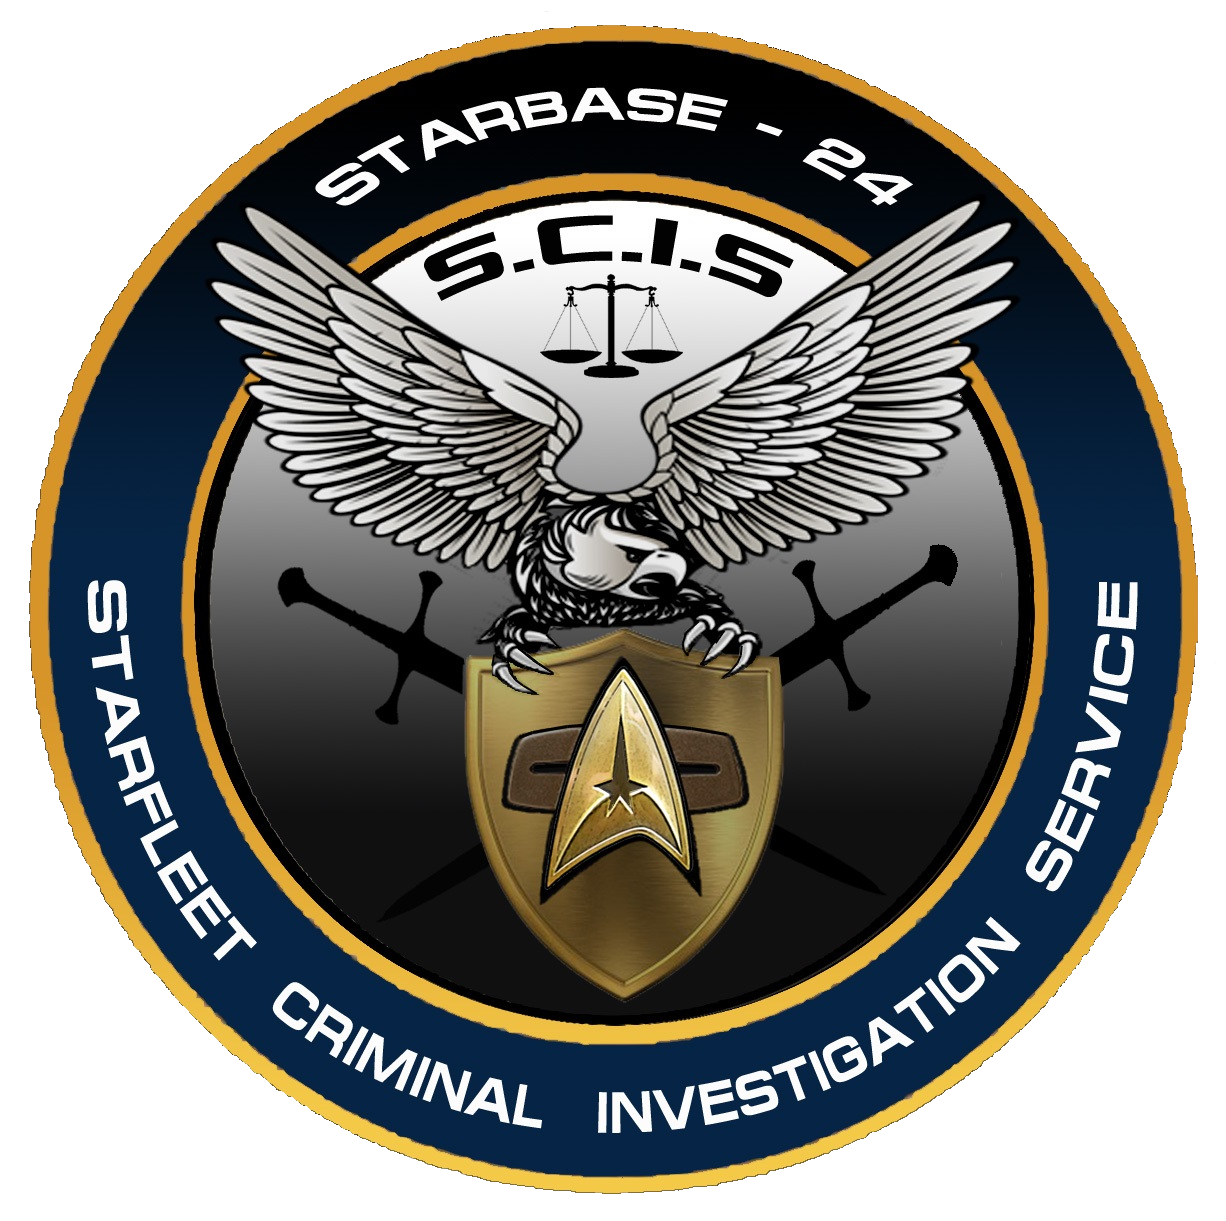 Specialist Divisions